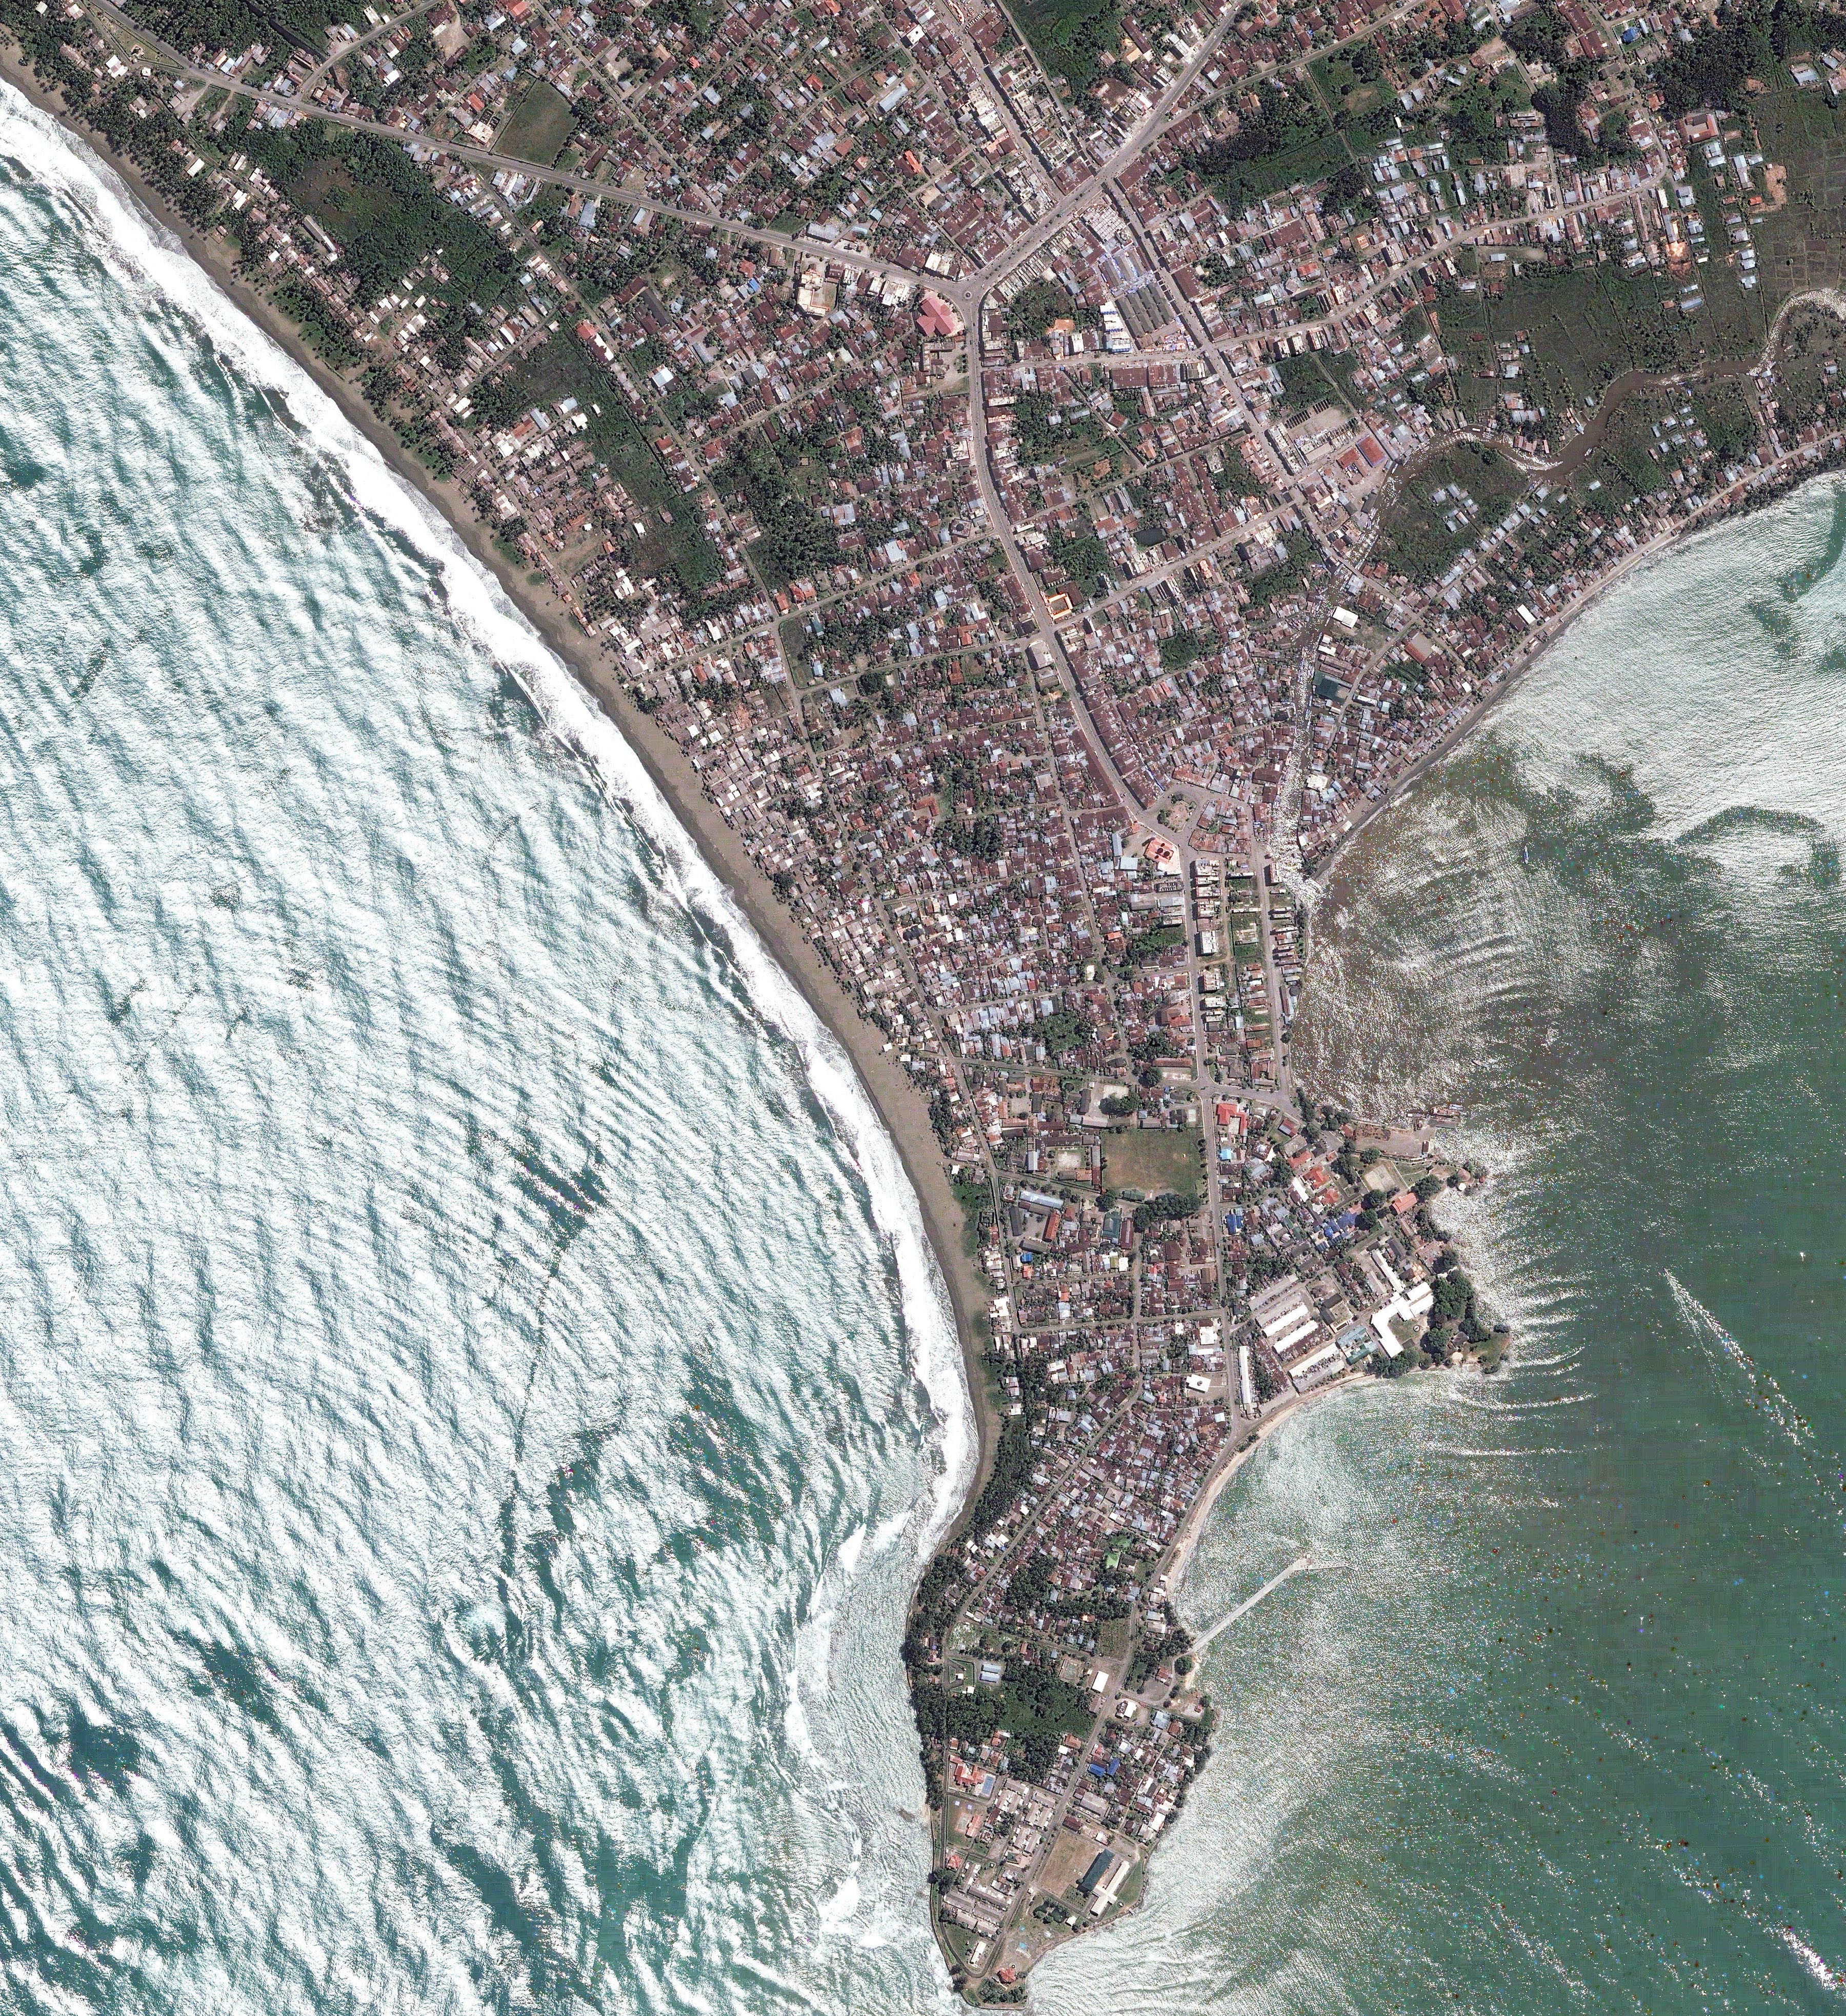 NASA Visible Earth: Earthquake Spawns Tsunamis